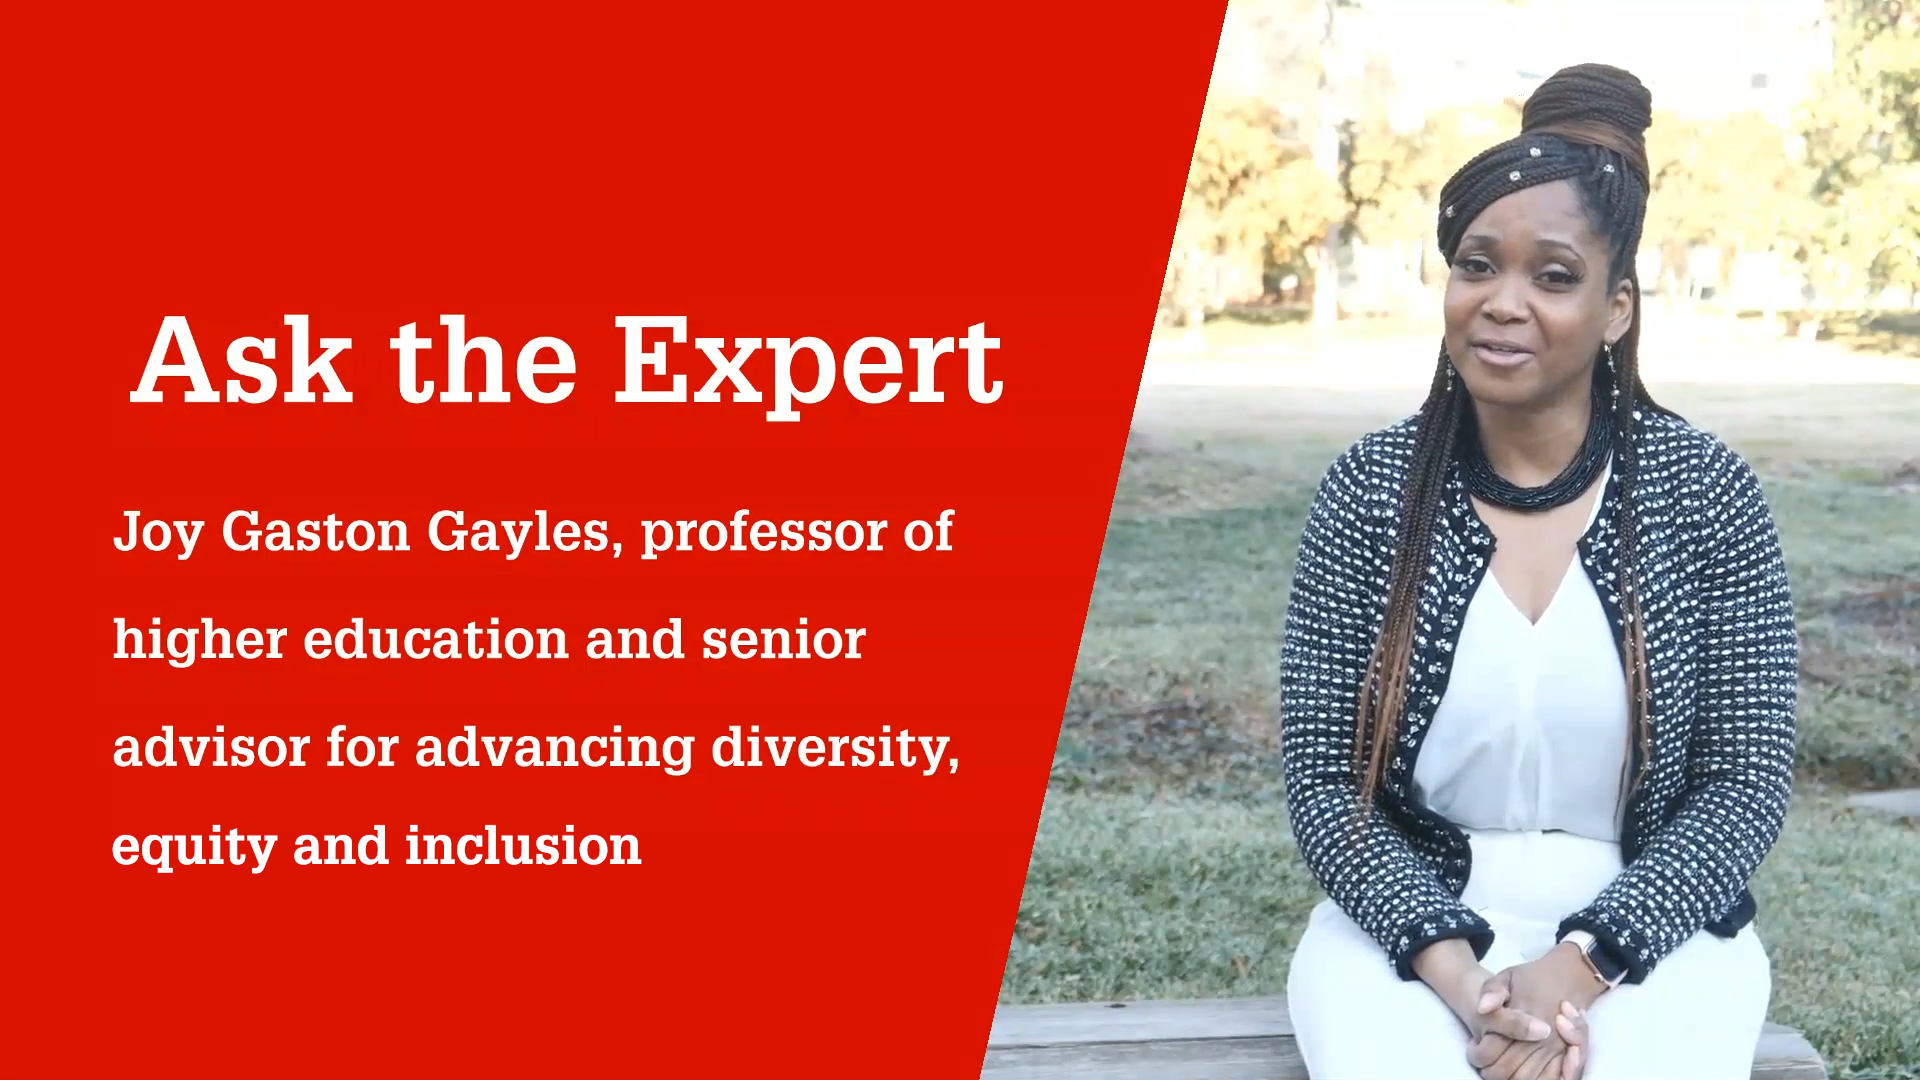 Professor Joy Gaston Gayles explains how educators can promote equity in their schools